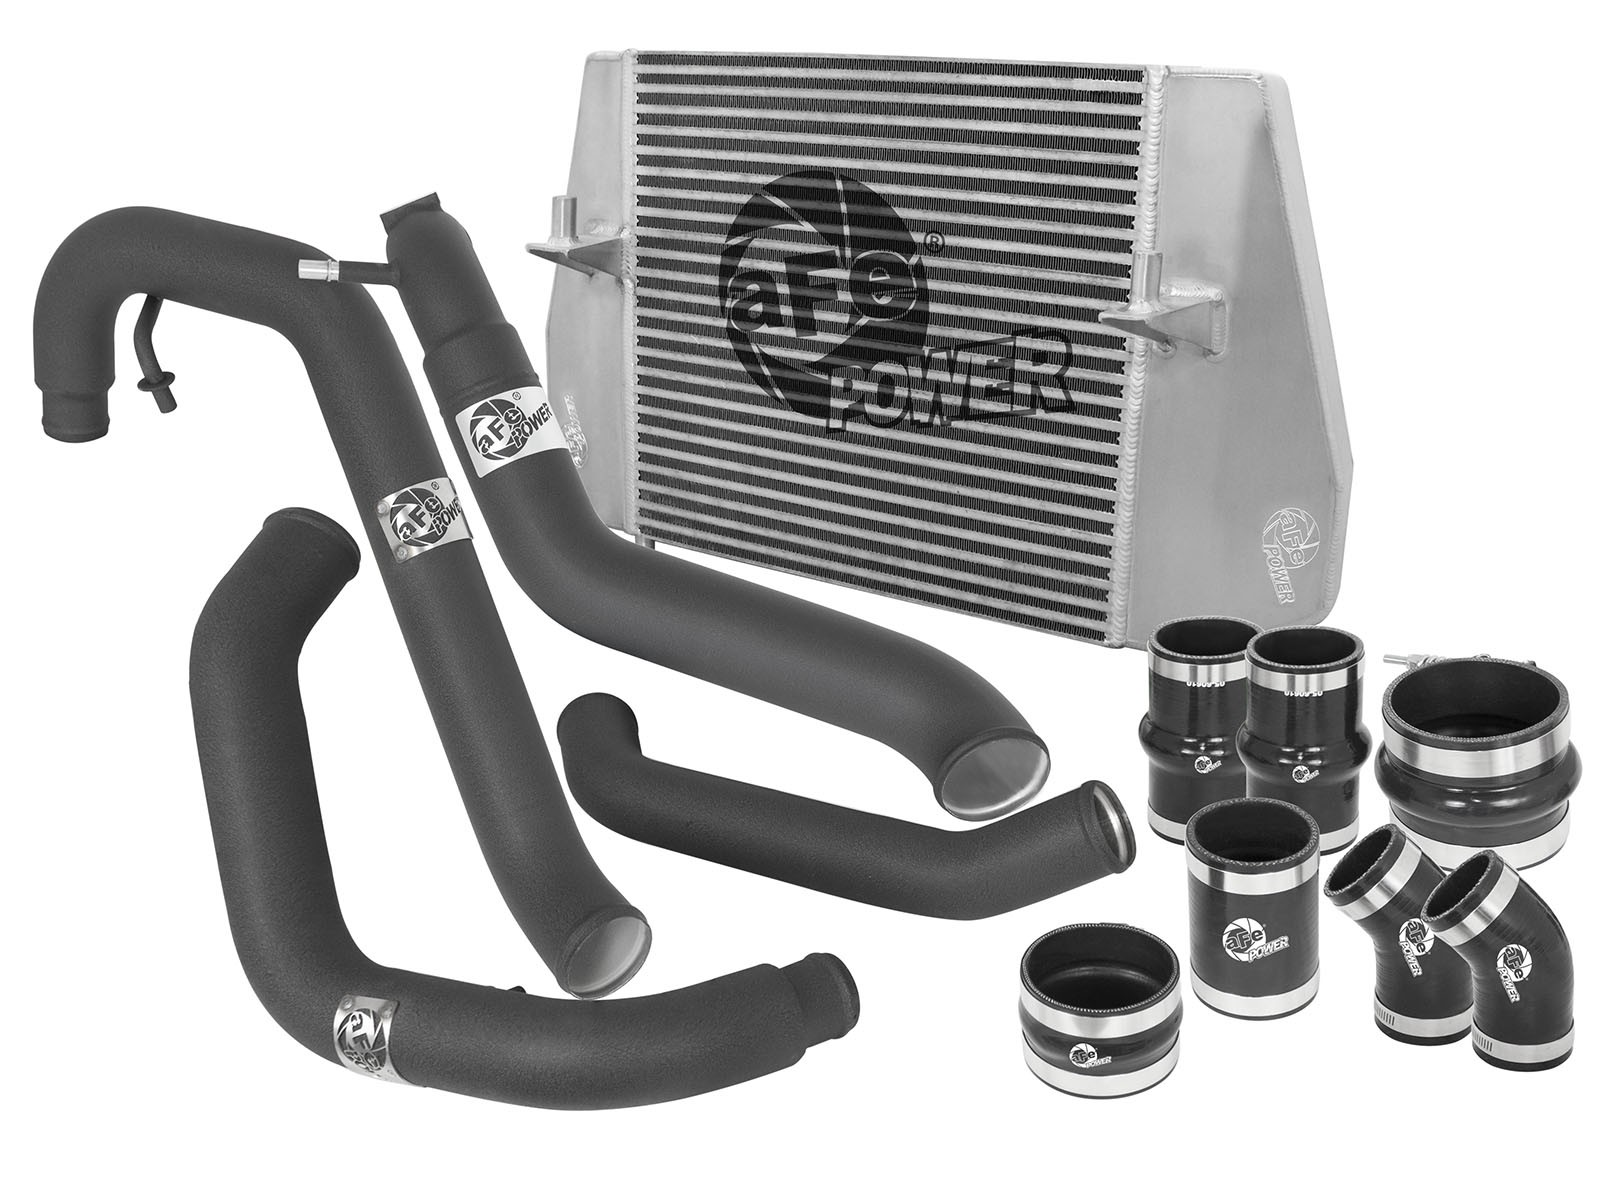 aFe POWER 46-20162-B BladeRunner GT Series Intercooler with Tubes